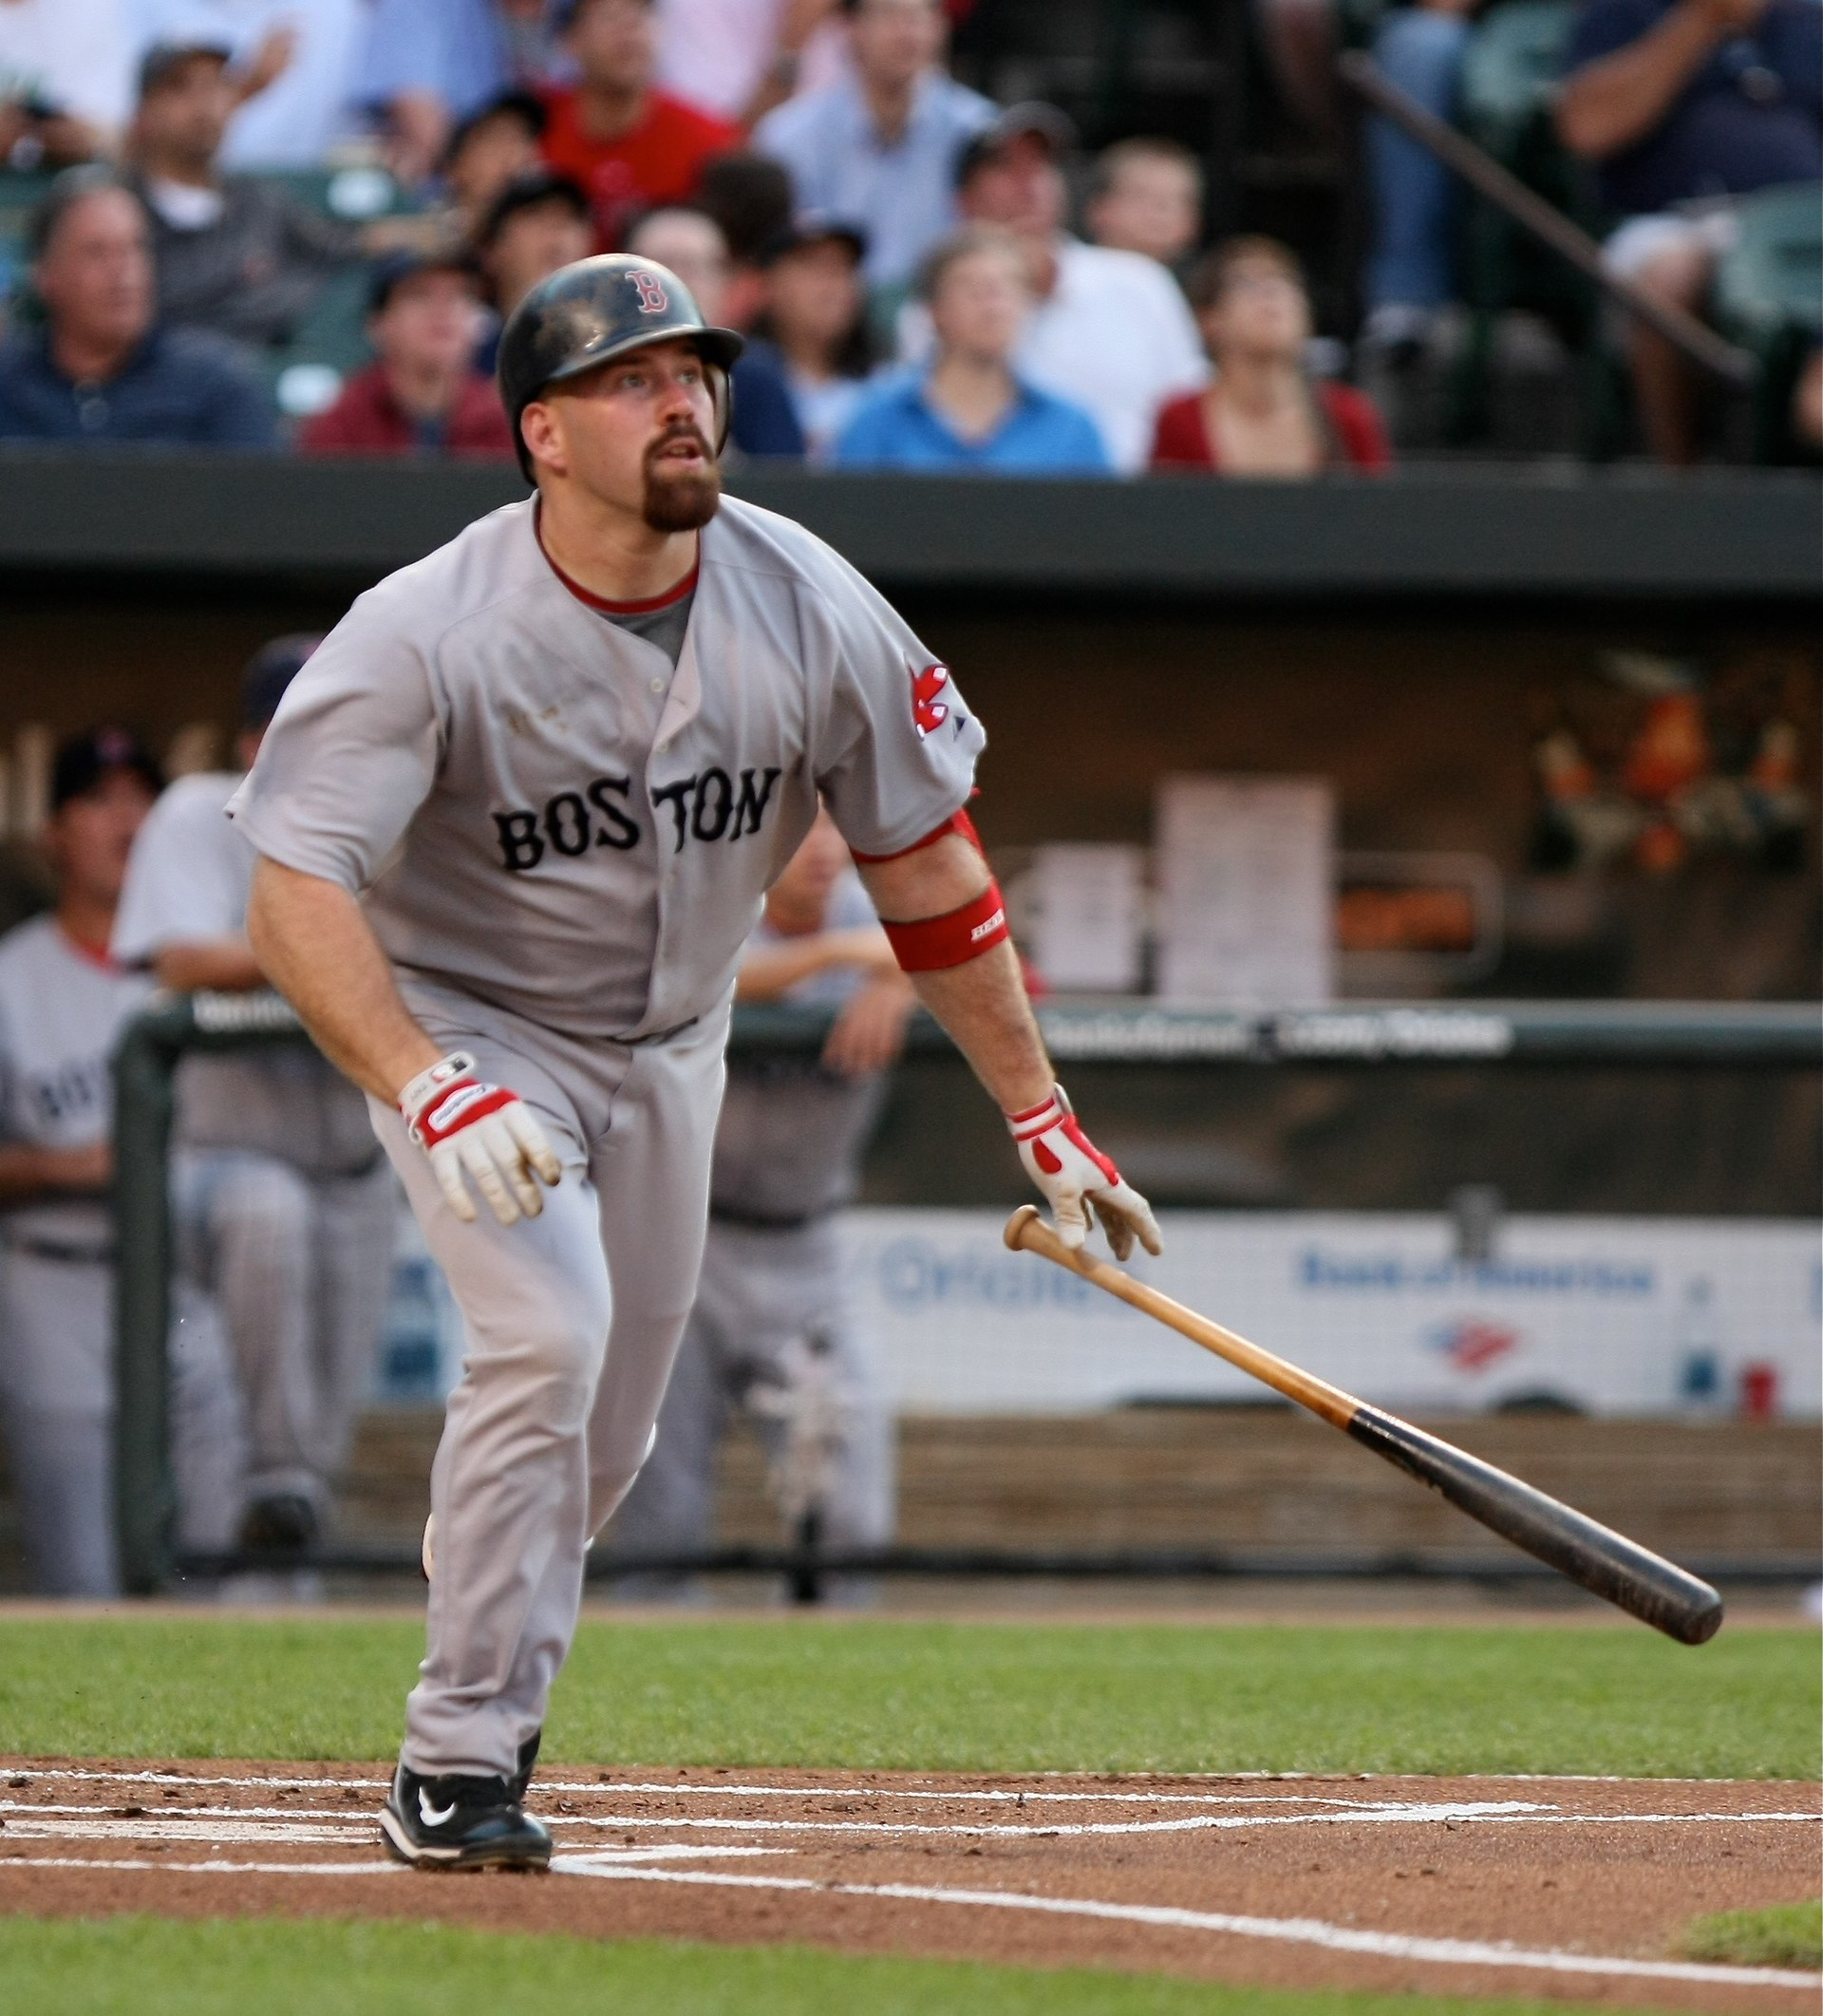 kevin youkilis baseball player sox 2009 spinners wikipedia lowell players star boston cincinnati youk pro beer last pawtucket worth bearcats